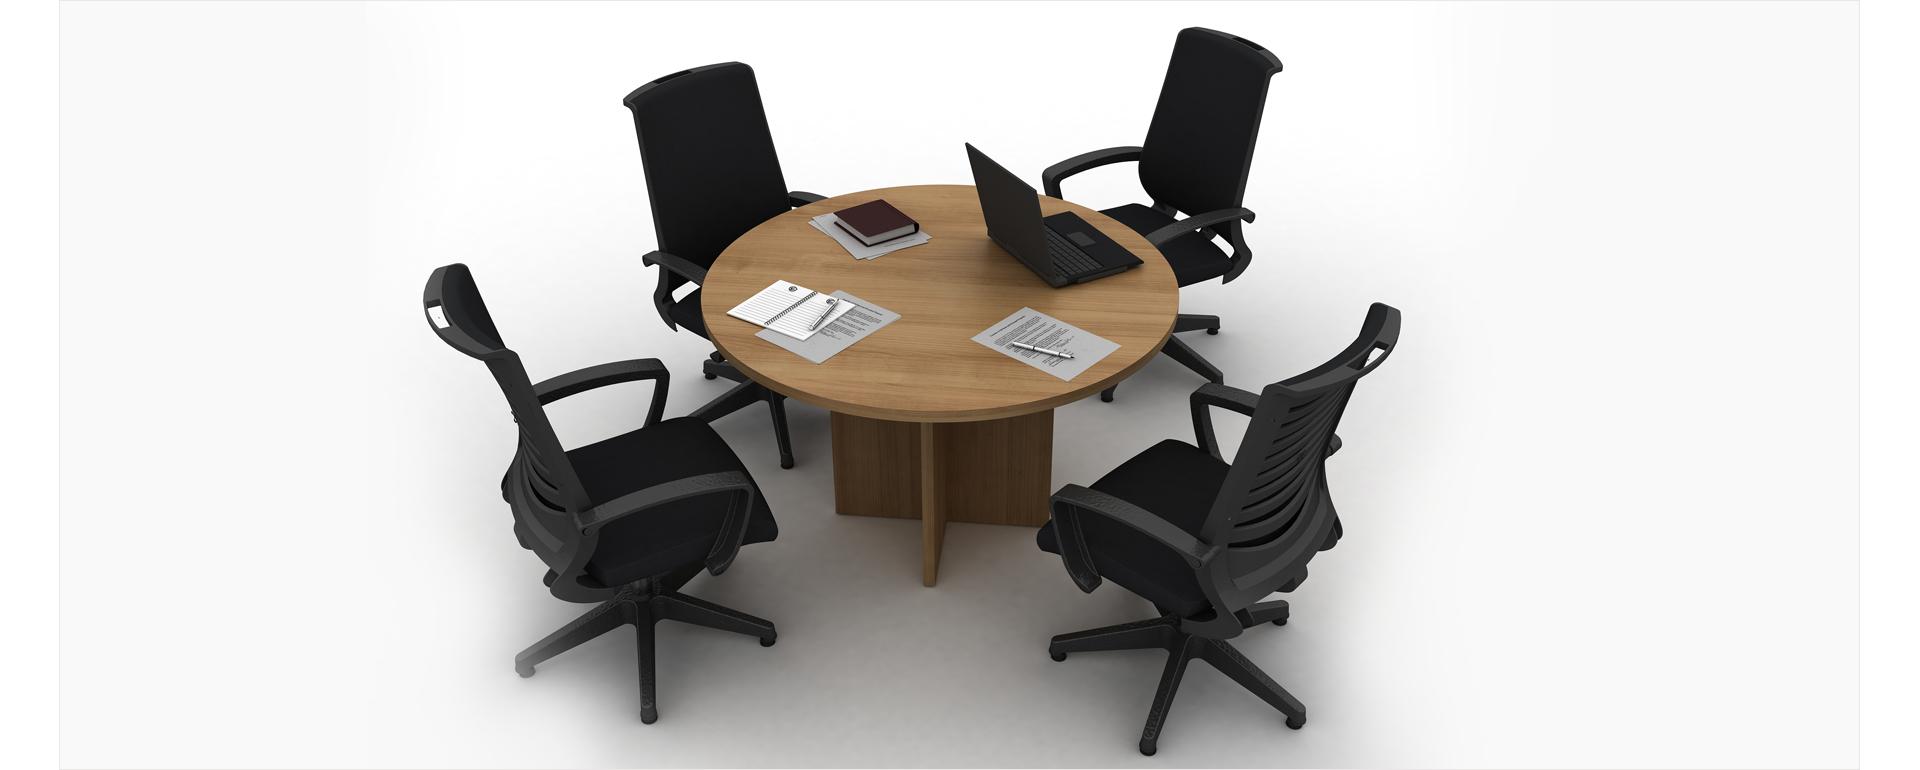 Innovative And Modern Round Wooden Meeting Desks Made In Turkey